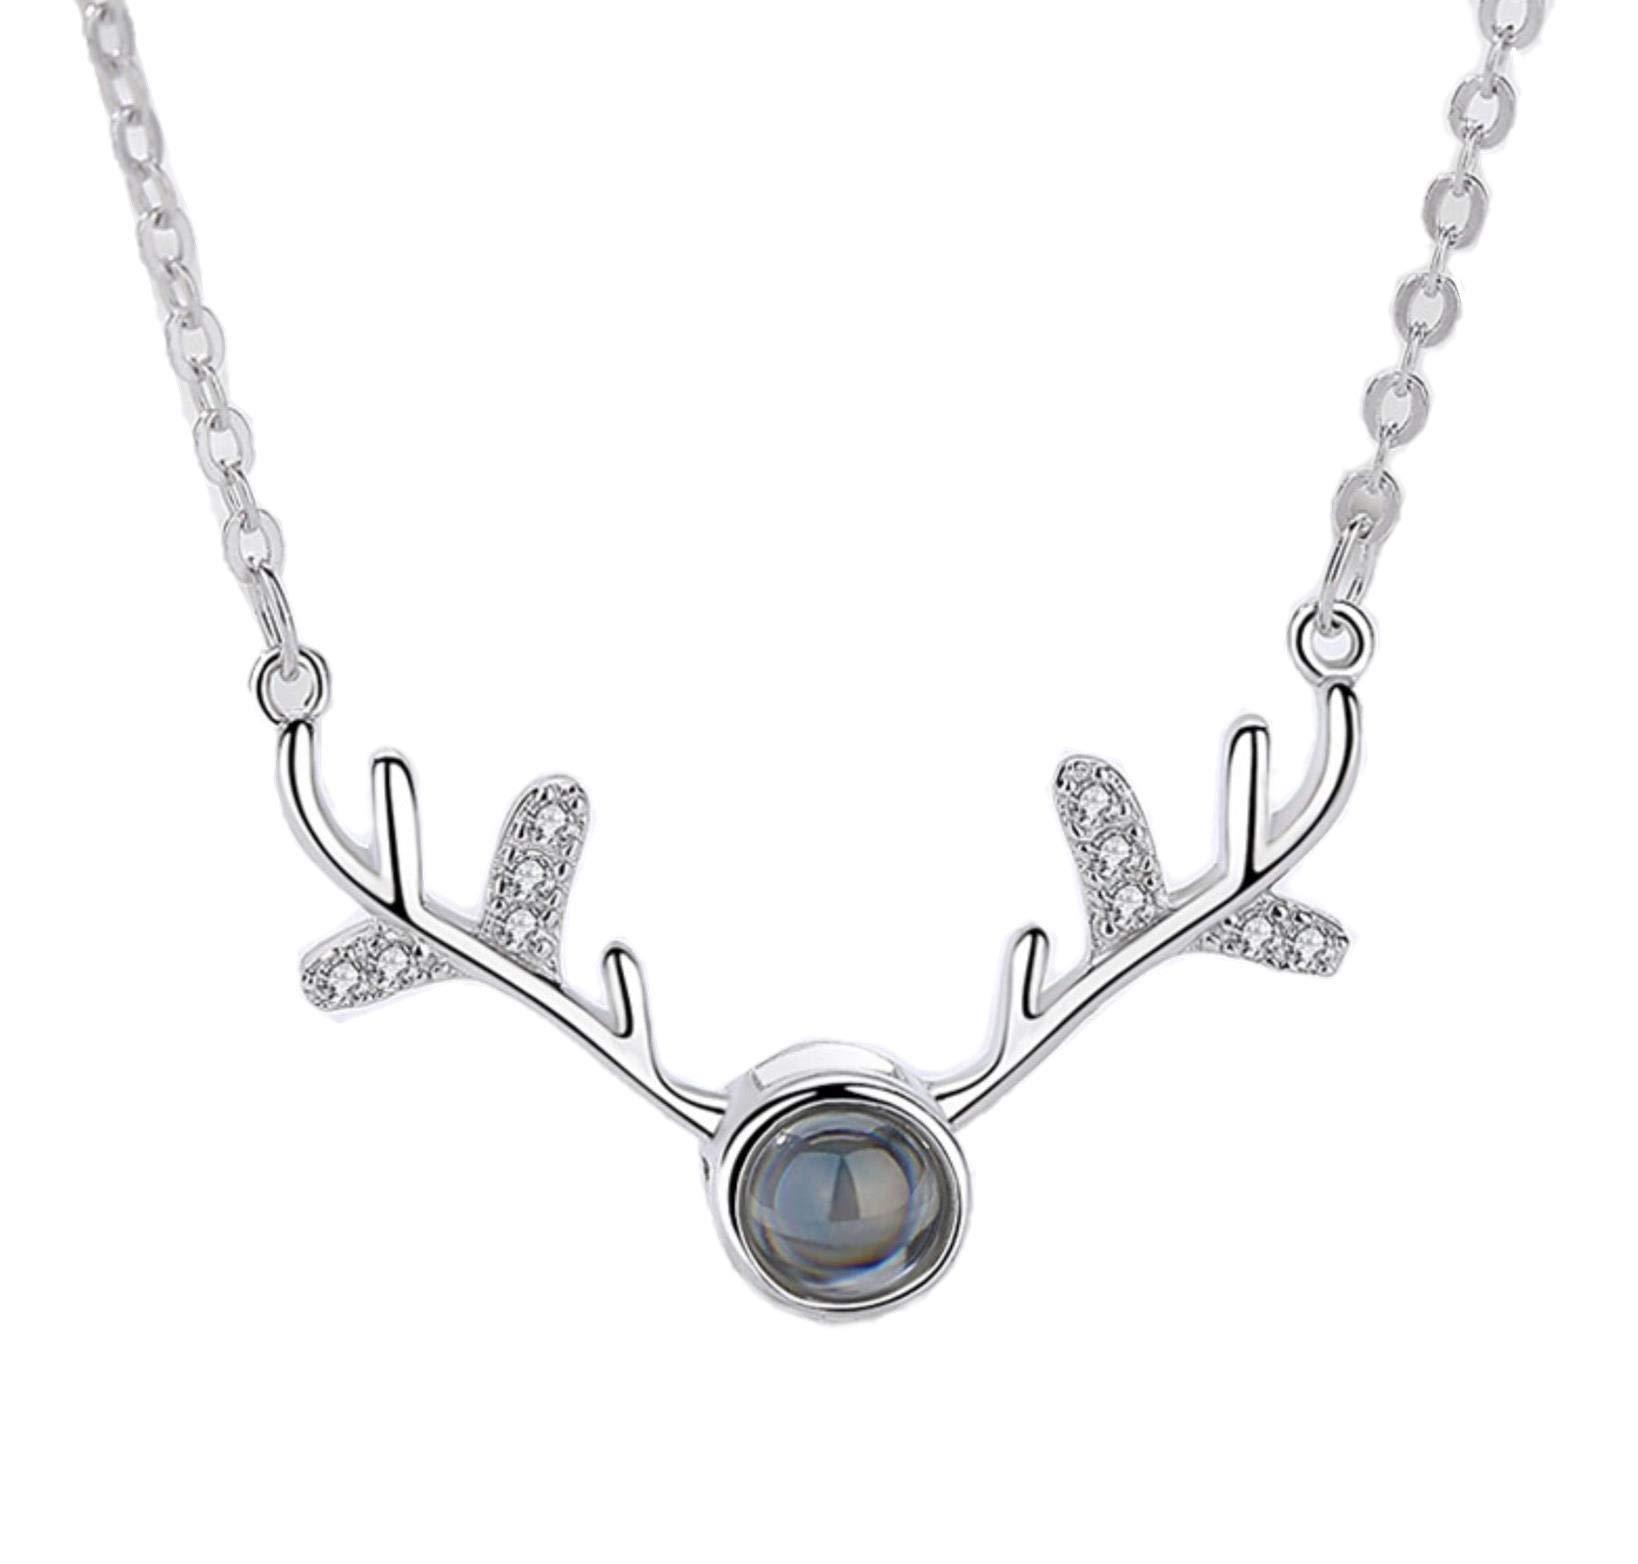 925 Sterling Silver Pendant CZ White Crystal Pendants Richy-Glory